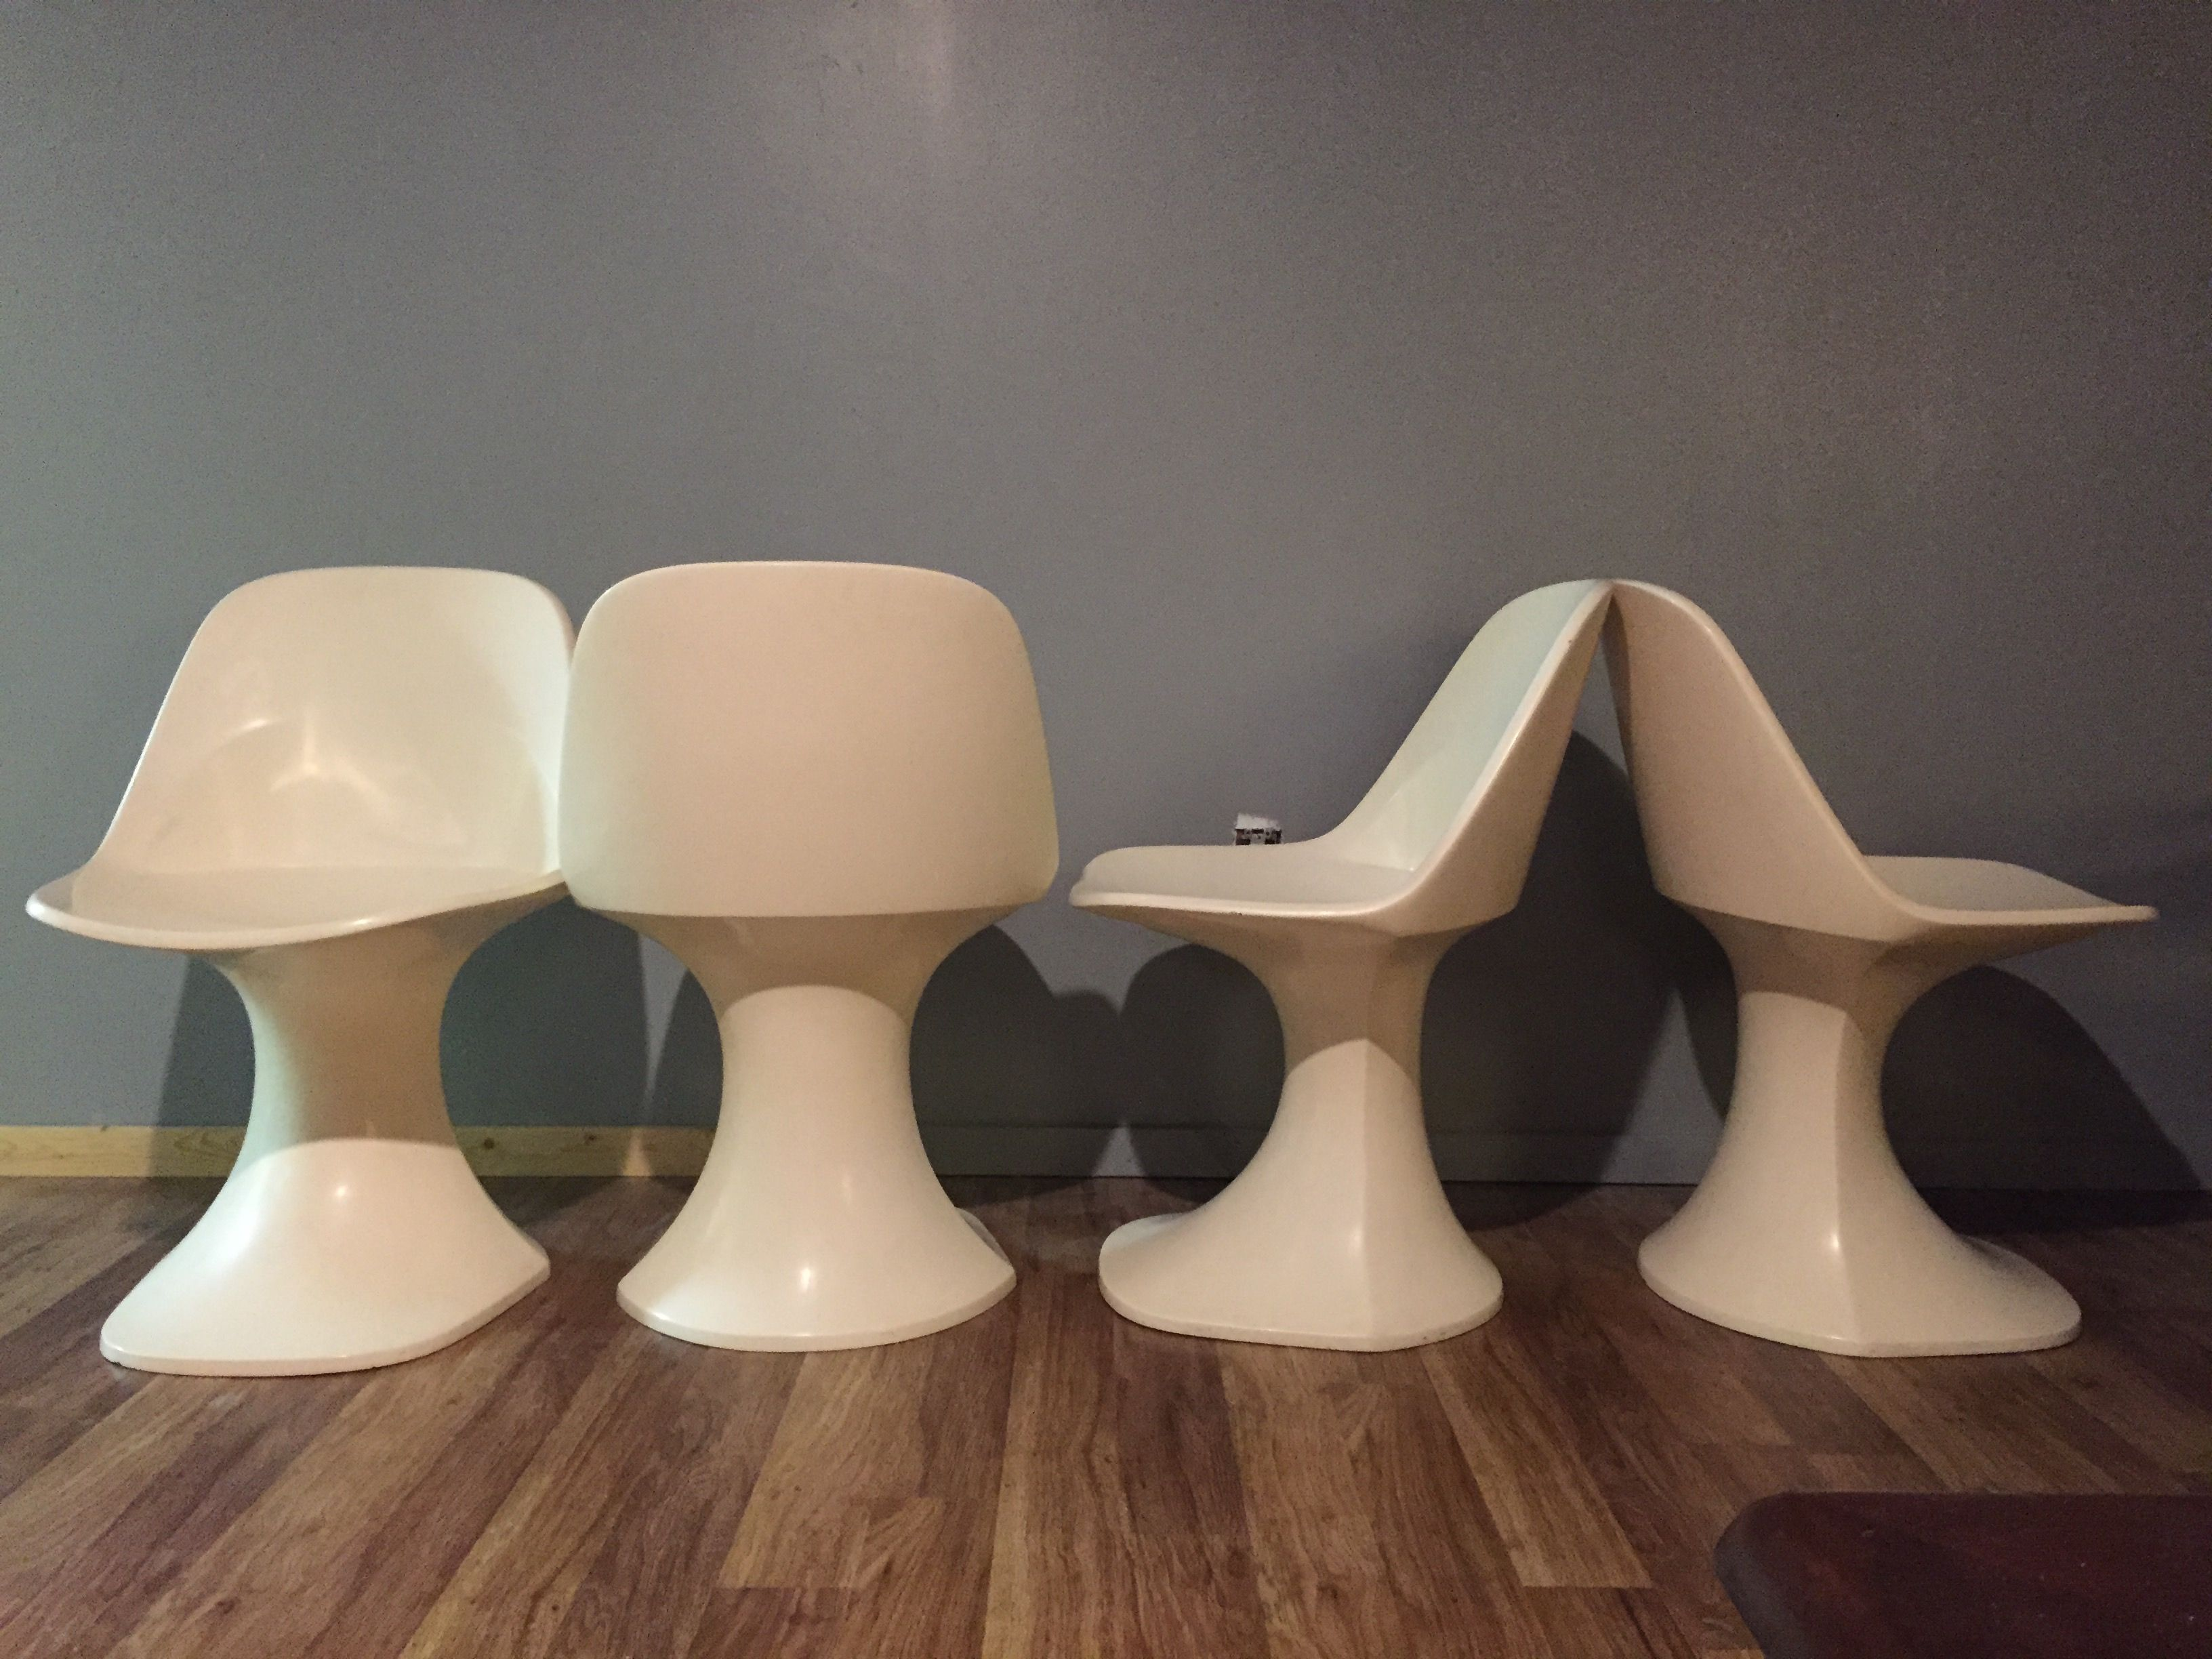 's fiberglass chairs by perttu mentula for pmddesign finland  - 's fiberglass chairs by perttu mentula for pmddesign finland